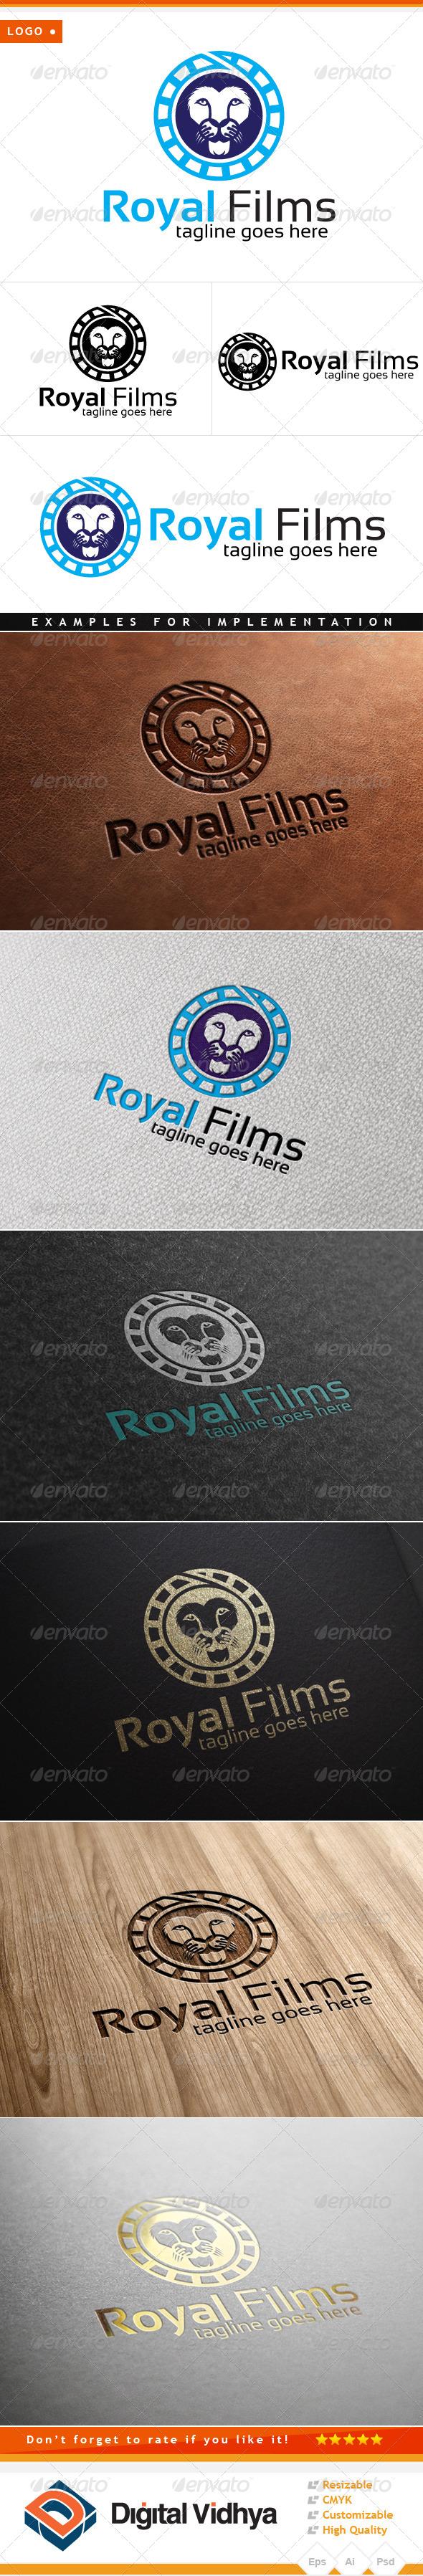 Lion & Films Logo